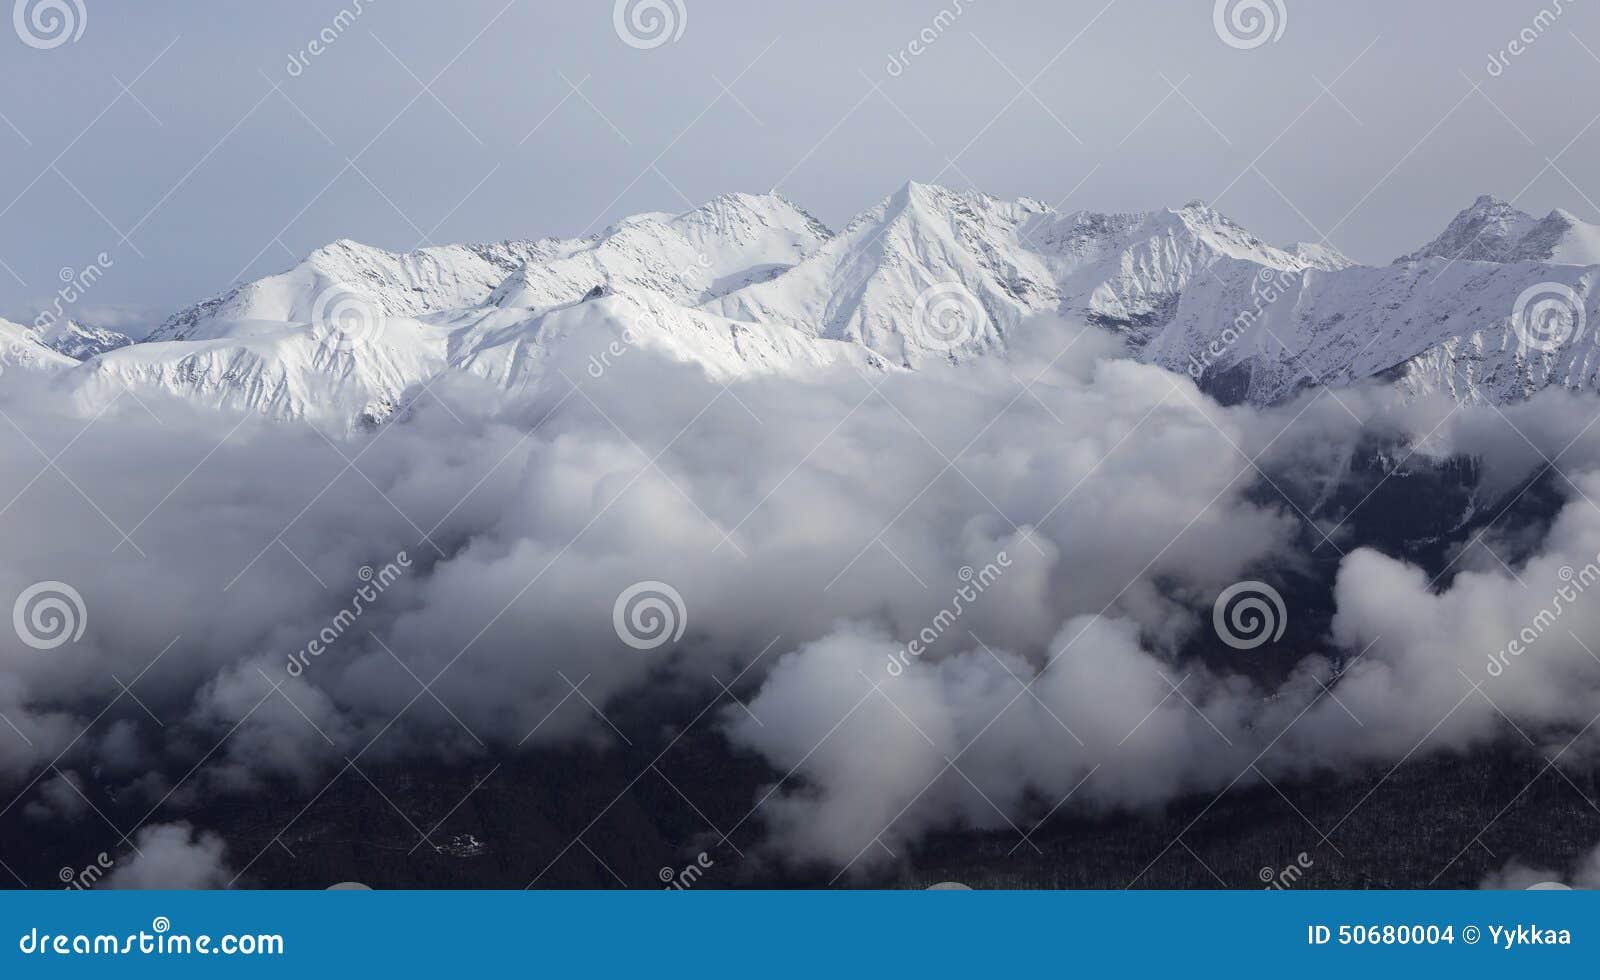 Download 高加索的美好的积雪覆盖的峰顶 库存照片. 图片 包括有 横向, 旅游业, 体育运动, 俄国, 休闲, 本质 - 50680004